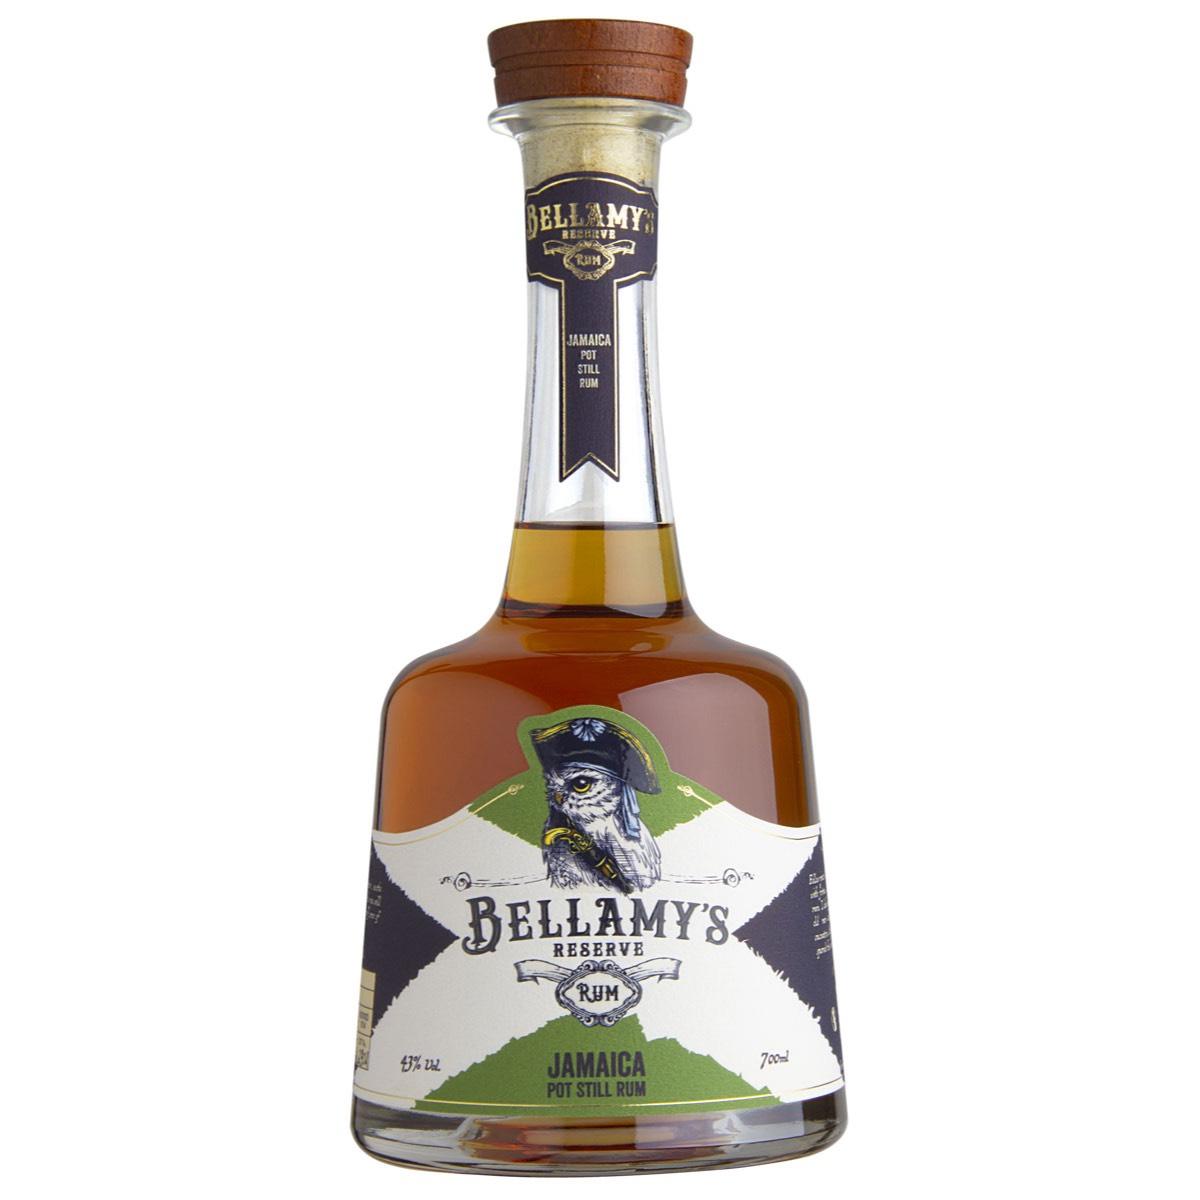 Bottle image of Bellamy's Reserve Rum Jamaica Pot Still Rum